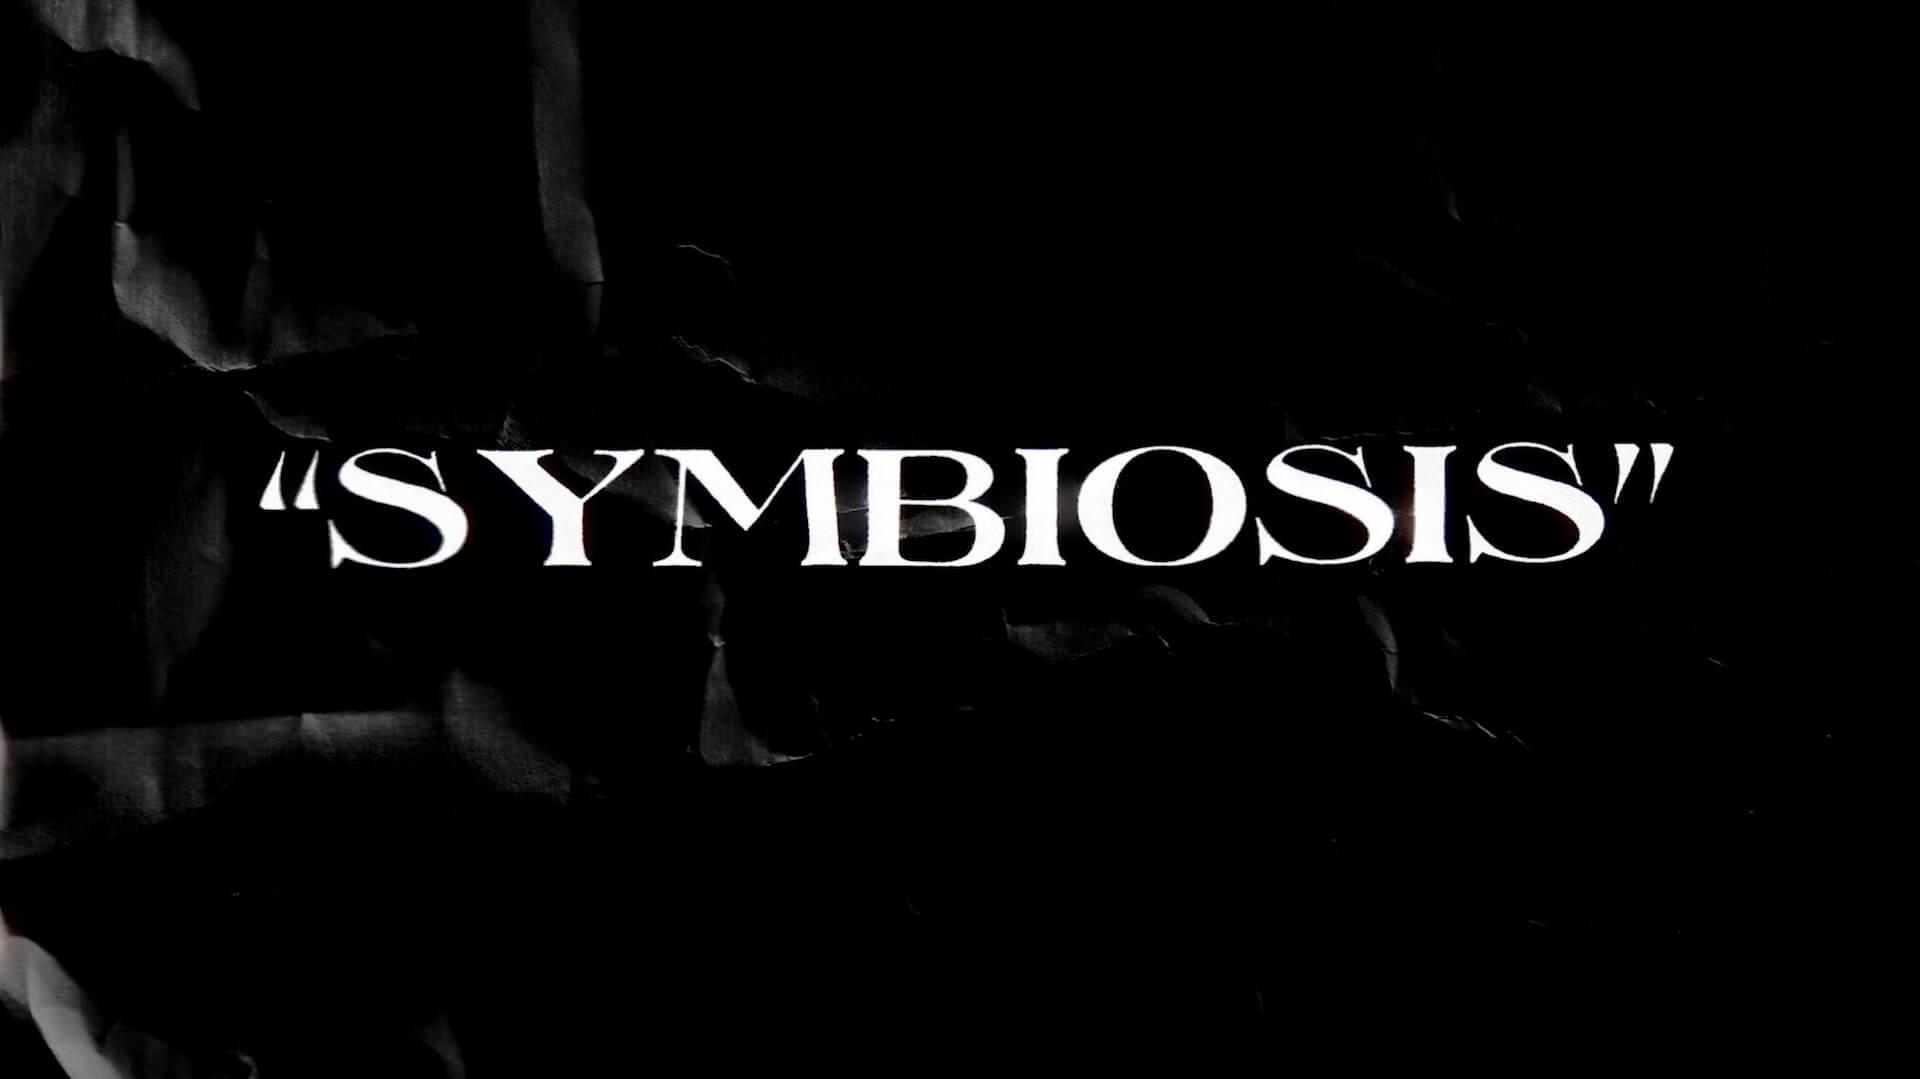 Diaspora skateboardsの新作ビデオ『SYMBIOSIS』の試写イベントにDaichi Yamamoto、tofubeatsが追加出演決定|アフターパーティーにAru-2、Kazuhiko Fujitaも music191226_diasporaskateboards_3